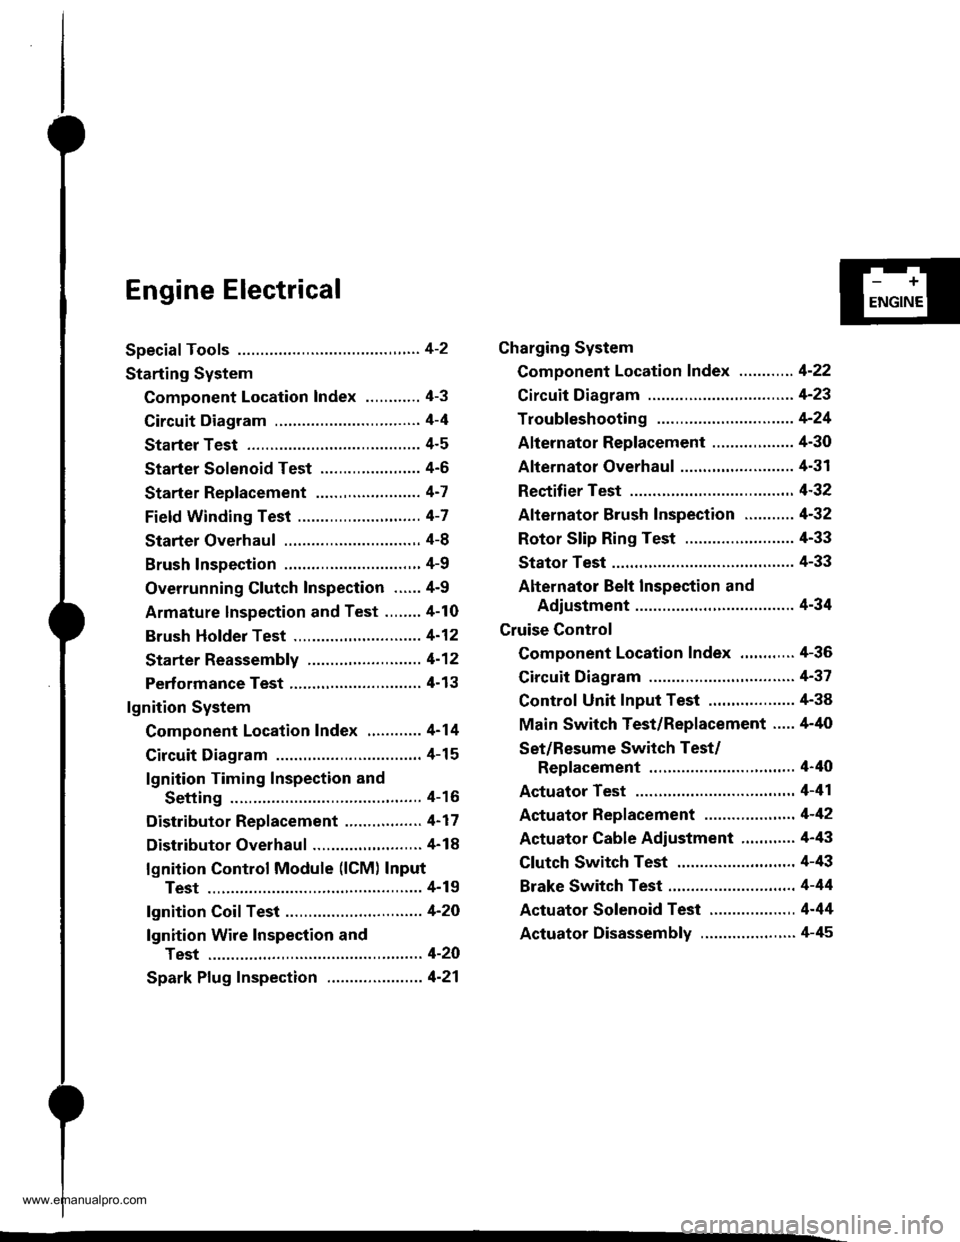 Honda Cr V Starter Wiring Diagram | Wiring Liry on jeep grand cherokee starter wiring diagram, subaru legacy starter wiring diagram, pontiac sunfire starter wiring diagram, ford five hundred starter wiring diagram, mini starter wiring diagram, ford bronco starter wiring diagram, hyundai sonata starter wiring diagram, dodge ram starter wiring diagram, ford f-250 starter wiring diagram,